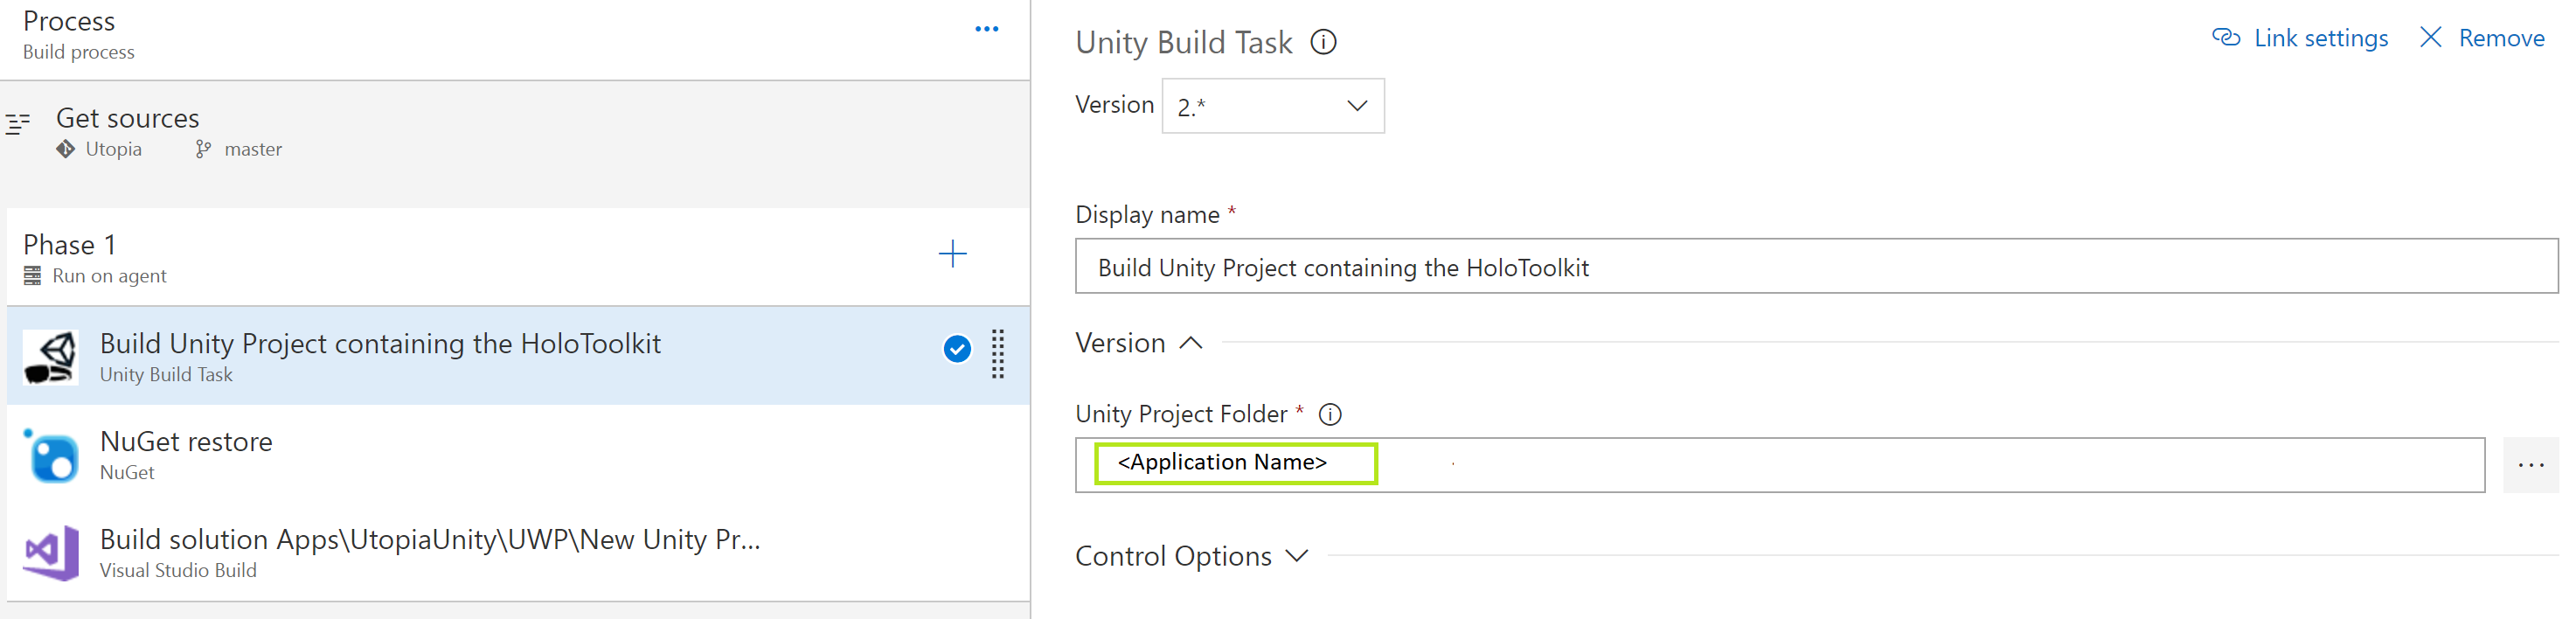 Unity project folder